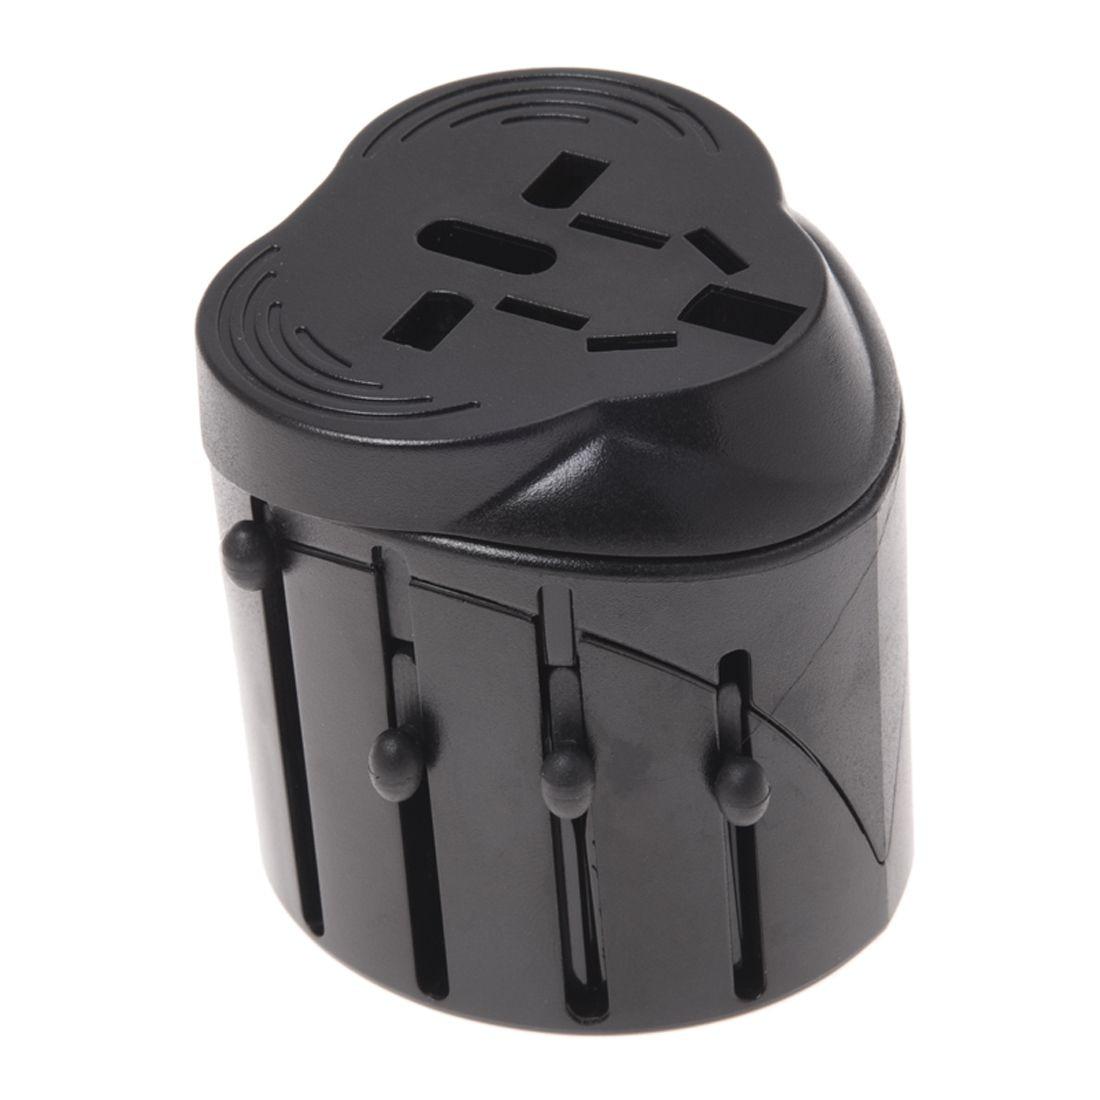 Universal Travel Dual Power Supply Plug Adapter Charger US/EU/UK/AU